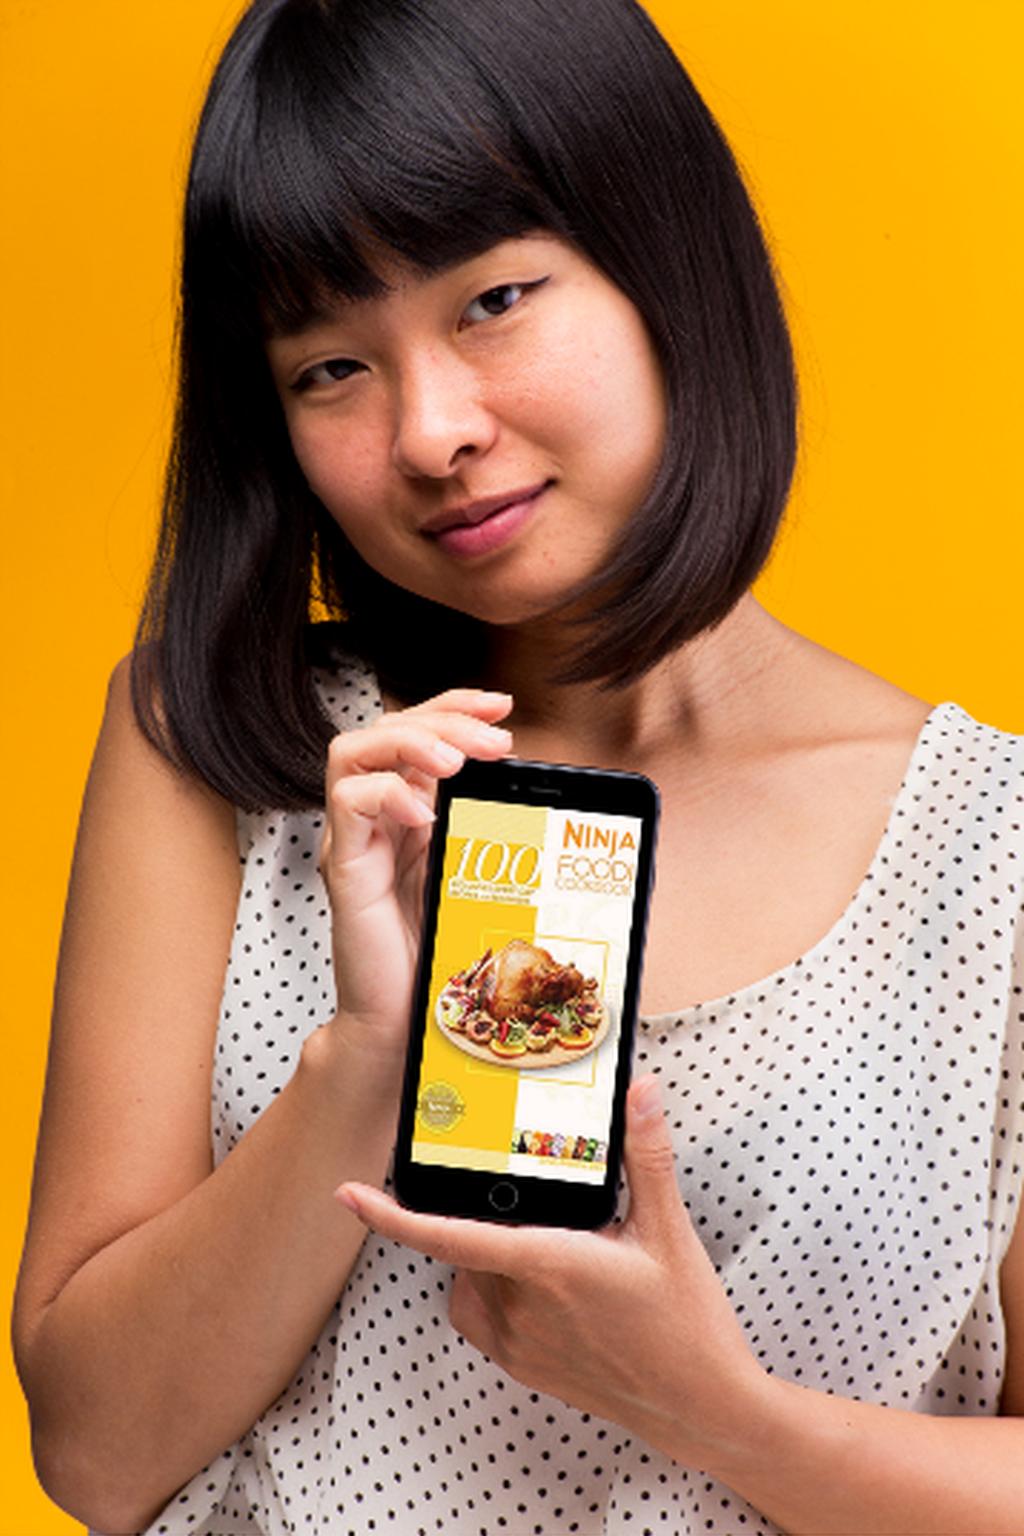 Ninja Foodi Cookbook: 100 Exclusive Everyday Recipes for Beginners